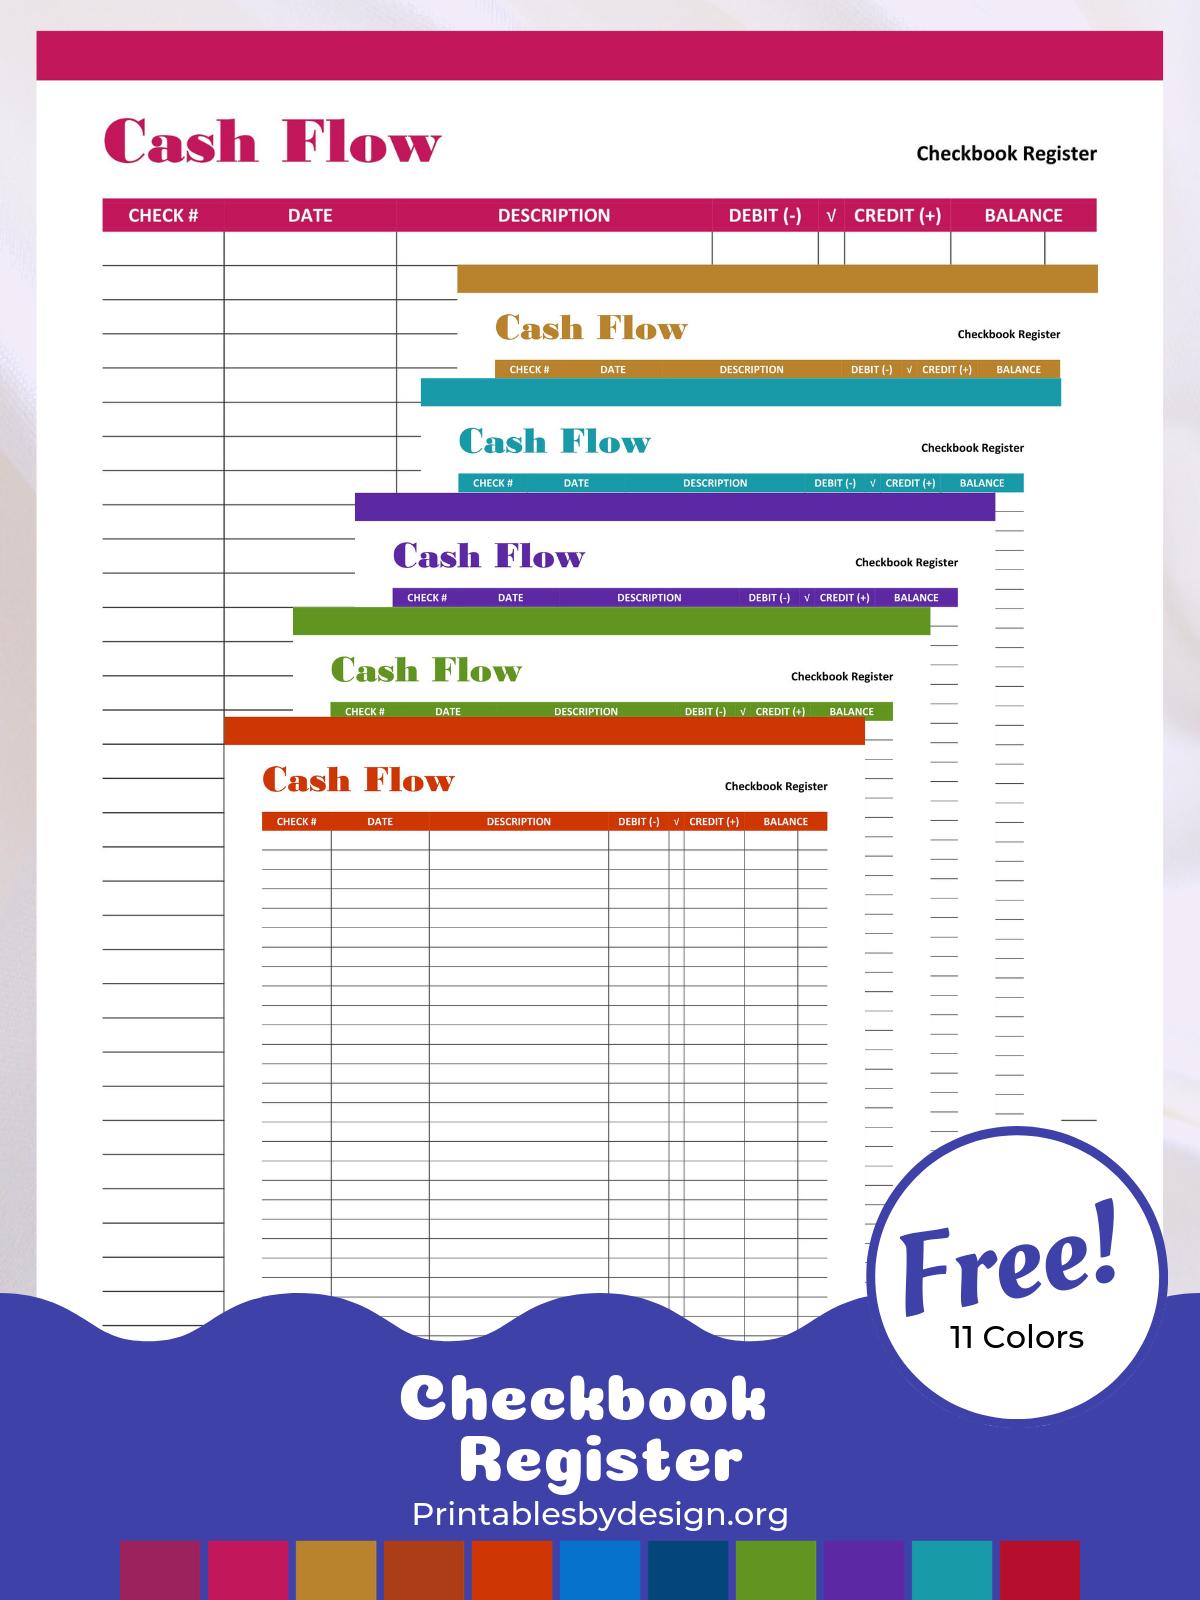 Checkbook Register Printables By Design